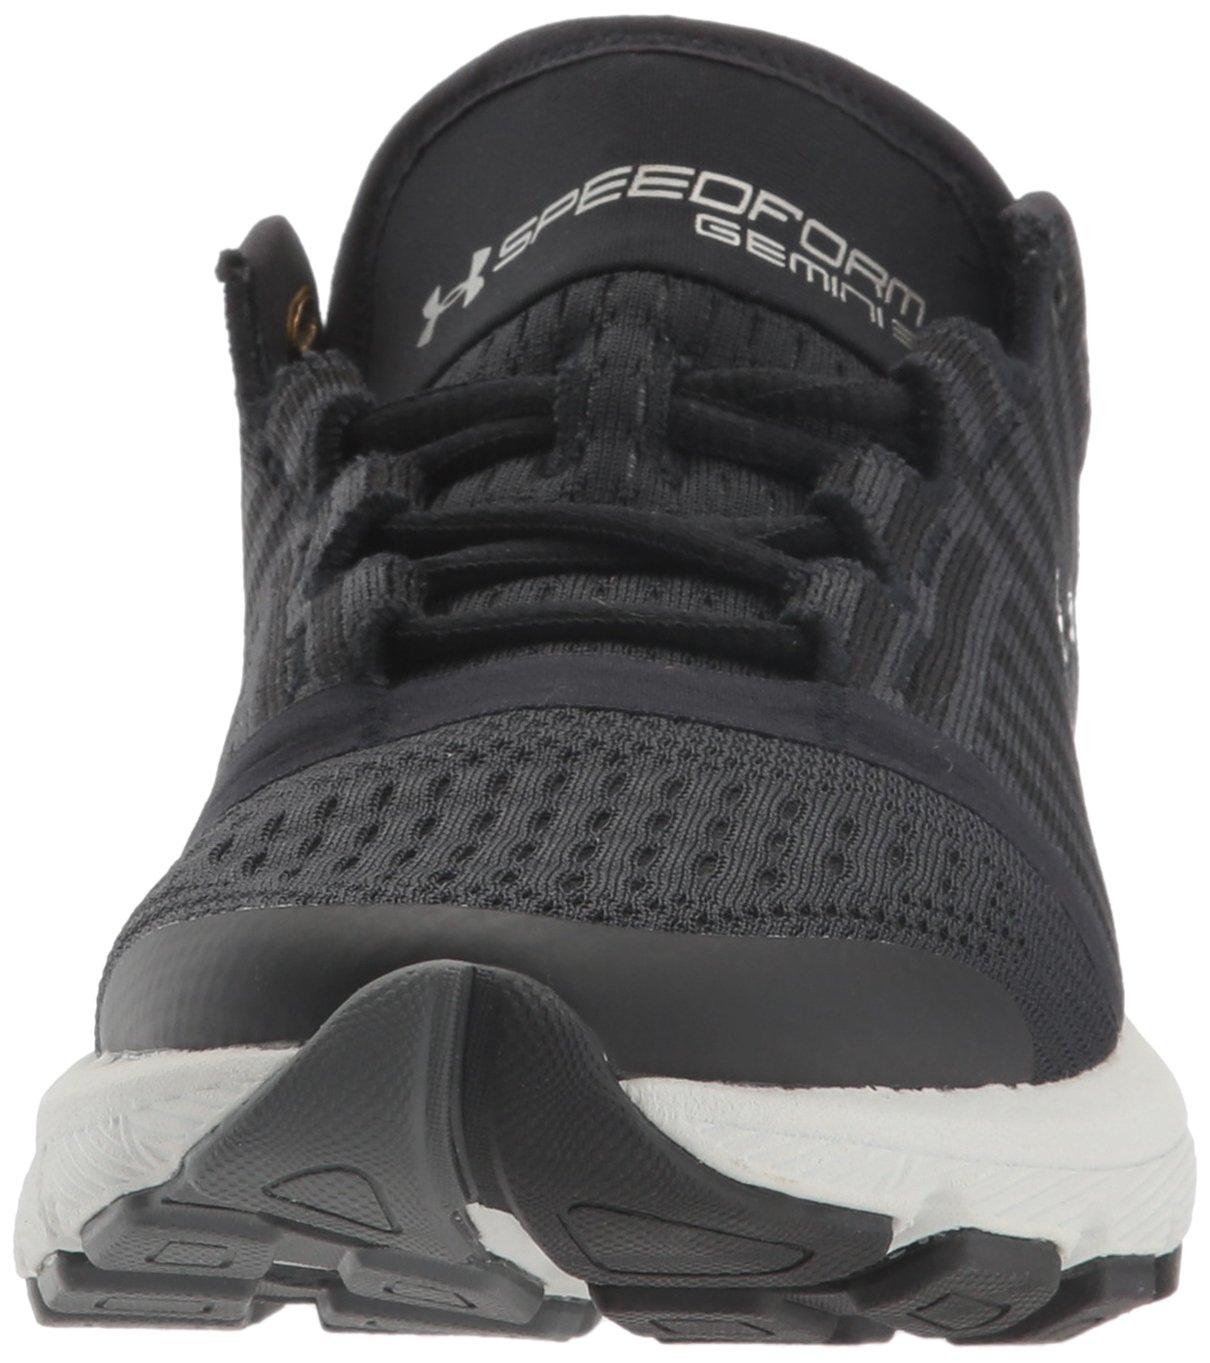 Under Armour Women's Speedform B01GP2ZAYC Gemini 3 Running Shoe B01GP2ZAYC Speedform 7.5 M US|Black (005)/Glacier Gray 364043